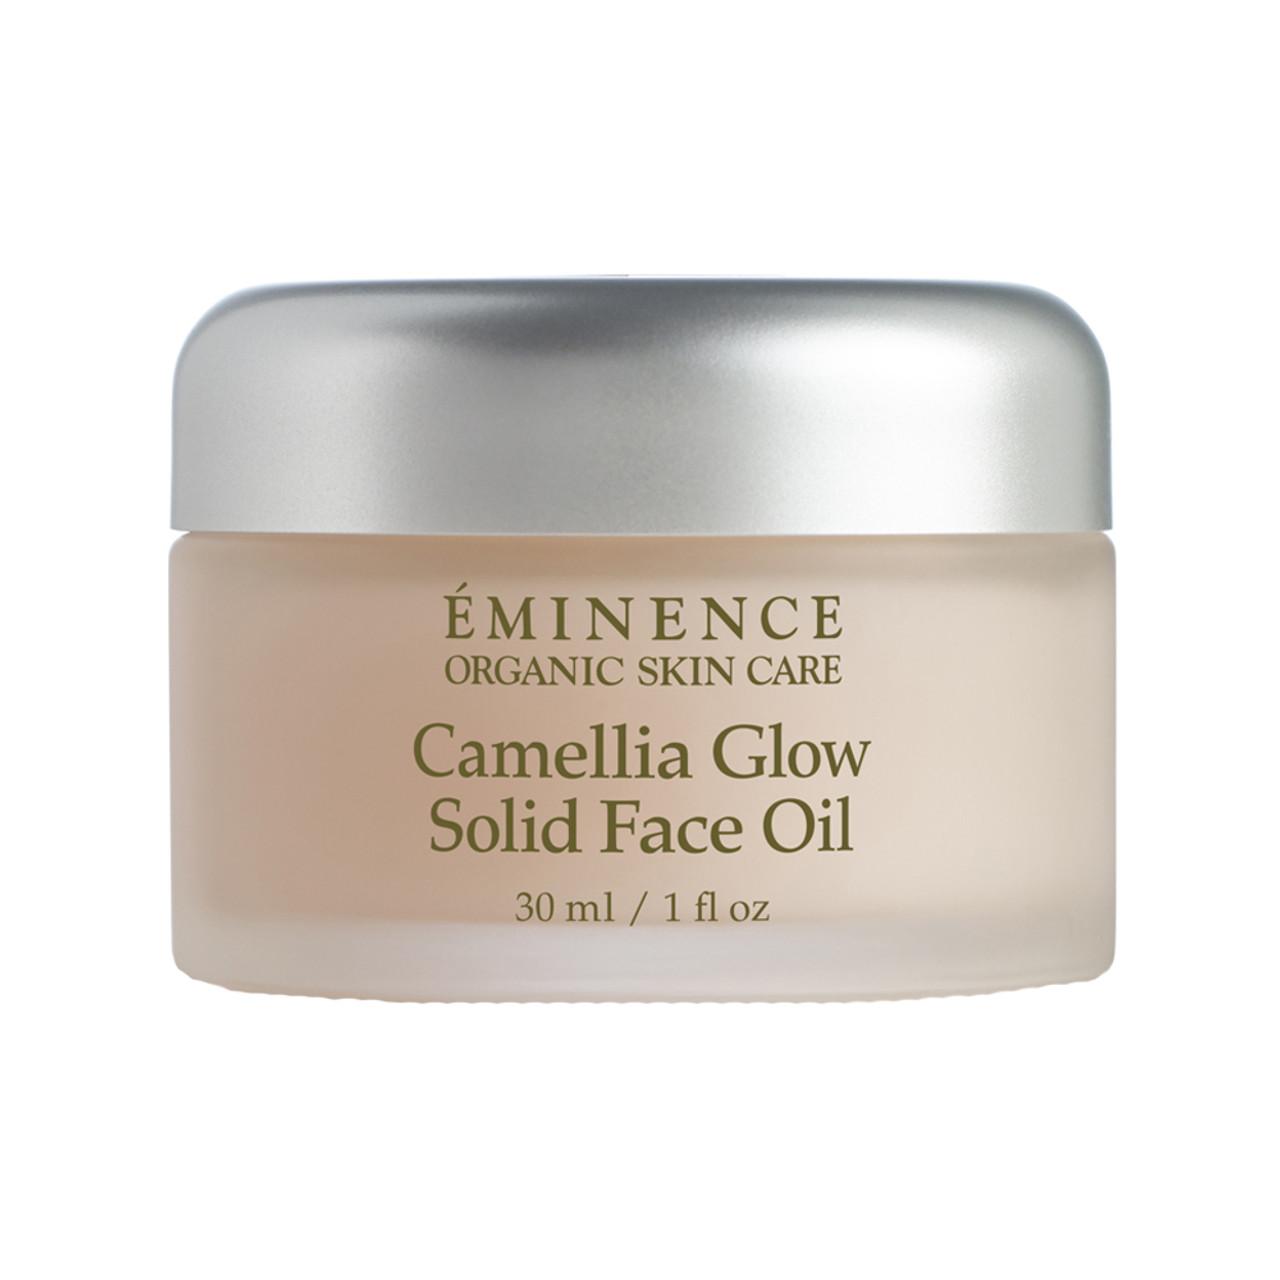 Eminence Camellia Glow Solid Face Oil BeautifiedYou.com